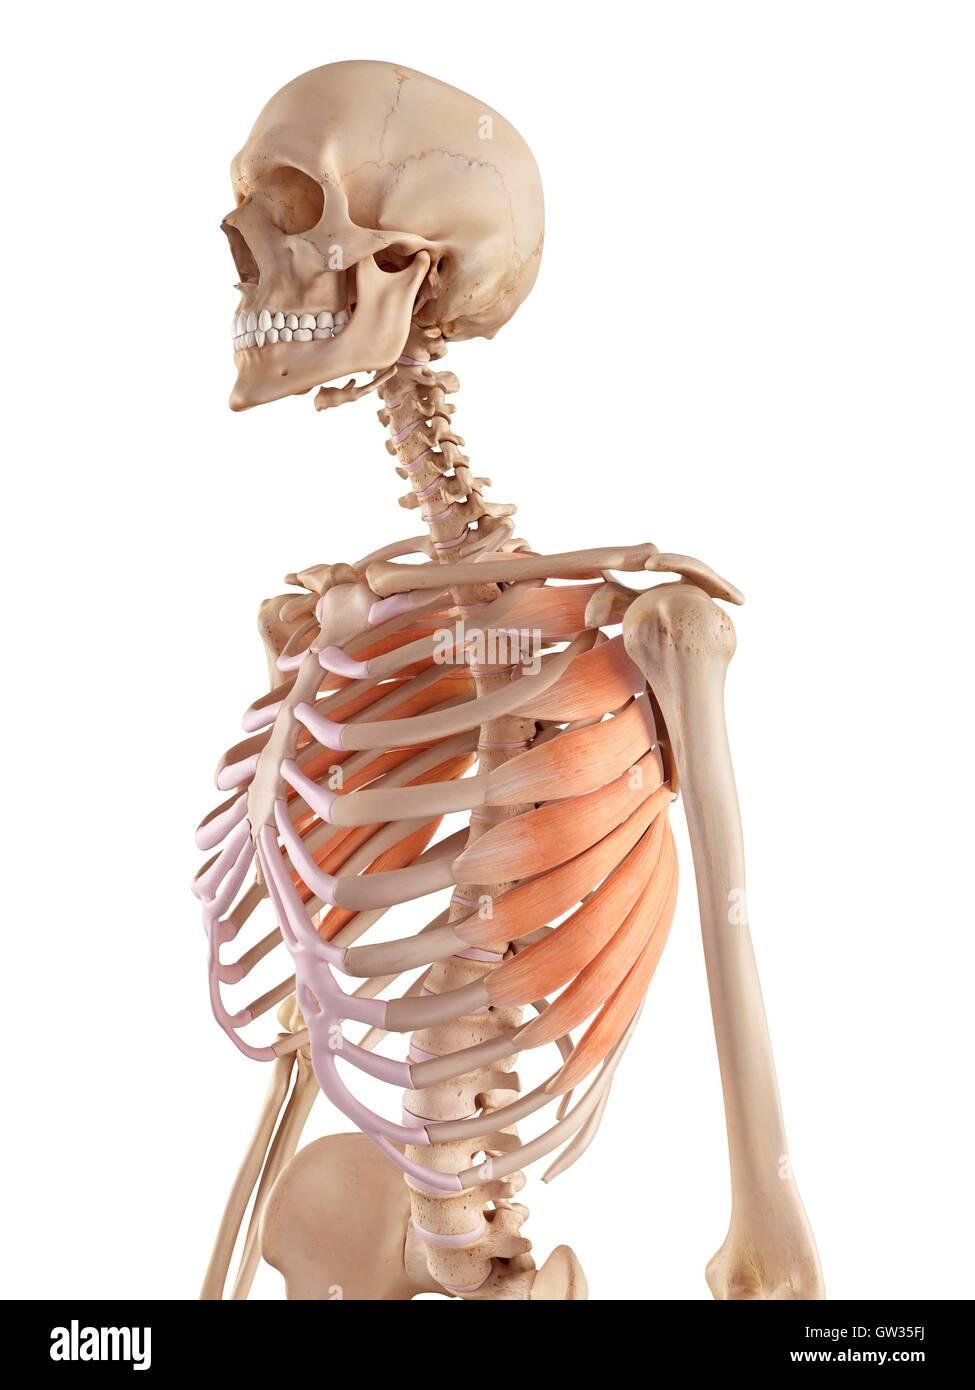 Human rib muscles, illustration Stock Photo: 118698822 - Alamy